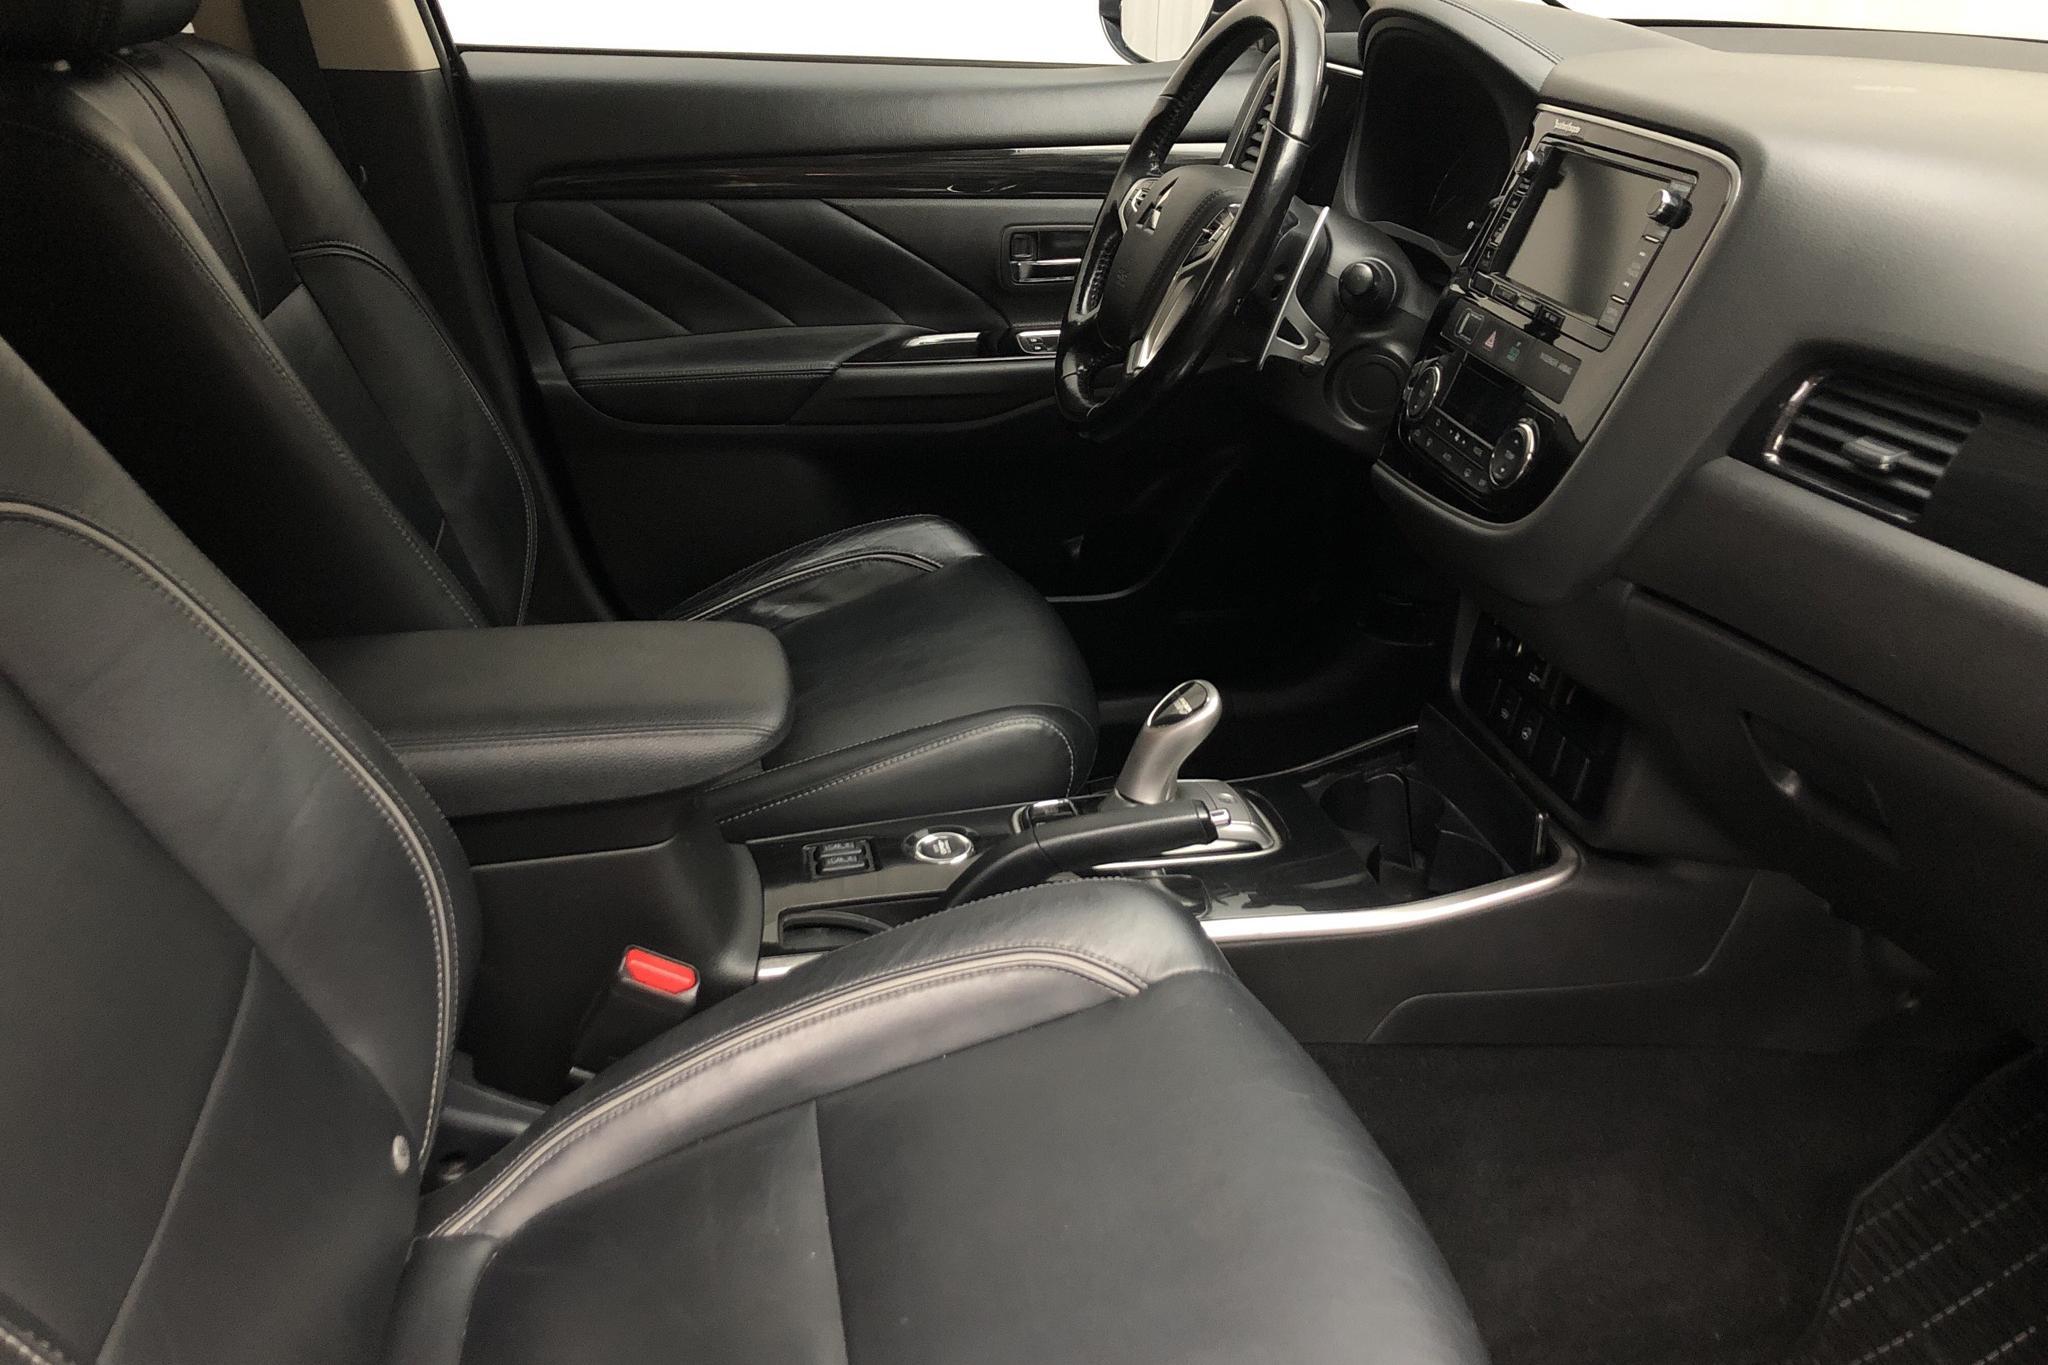 Mitsubishi Outlander 2.0 Plug-in Hybrid 4WD (121hk) - 14 009 mil - Automat - svart - 2016